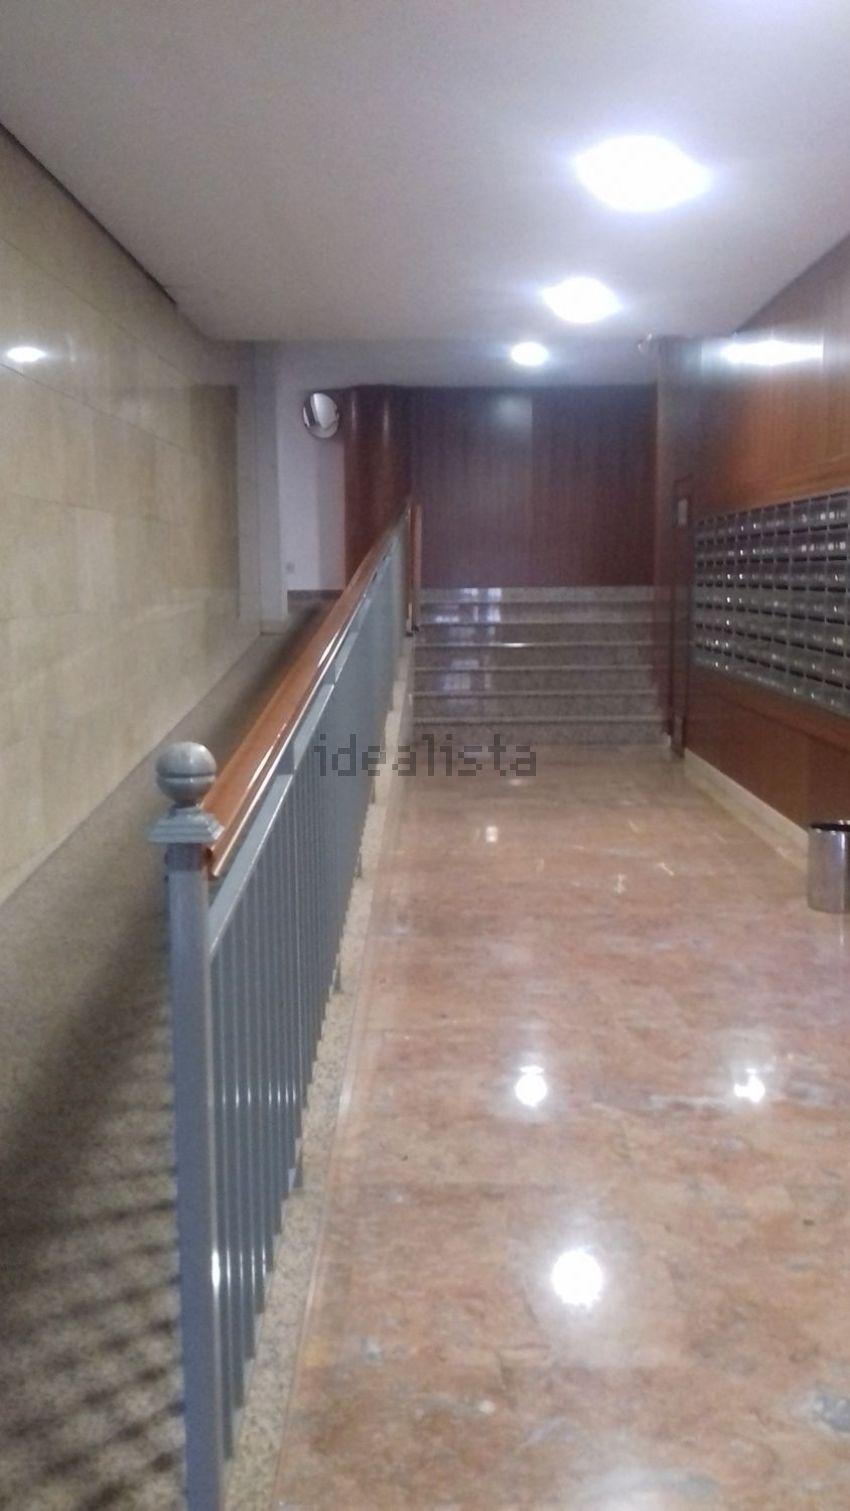 Piso en calle San Francisco de Borja, 9, Universidad San Francisco, Zaragoza